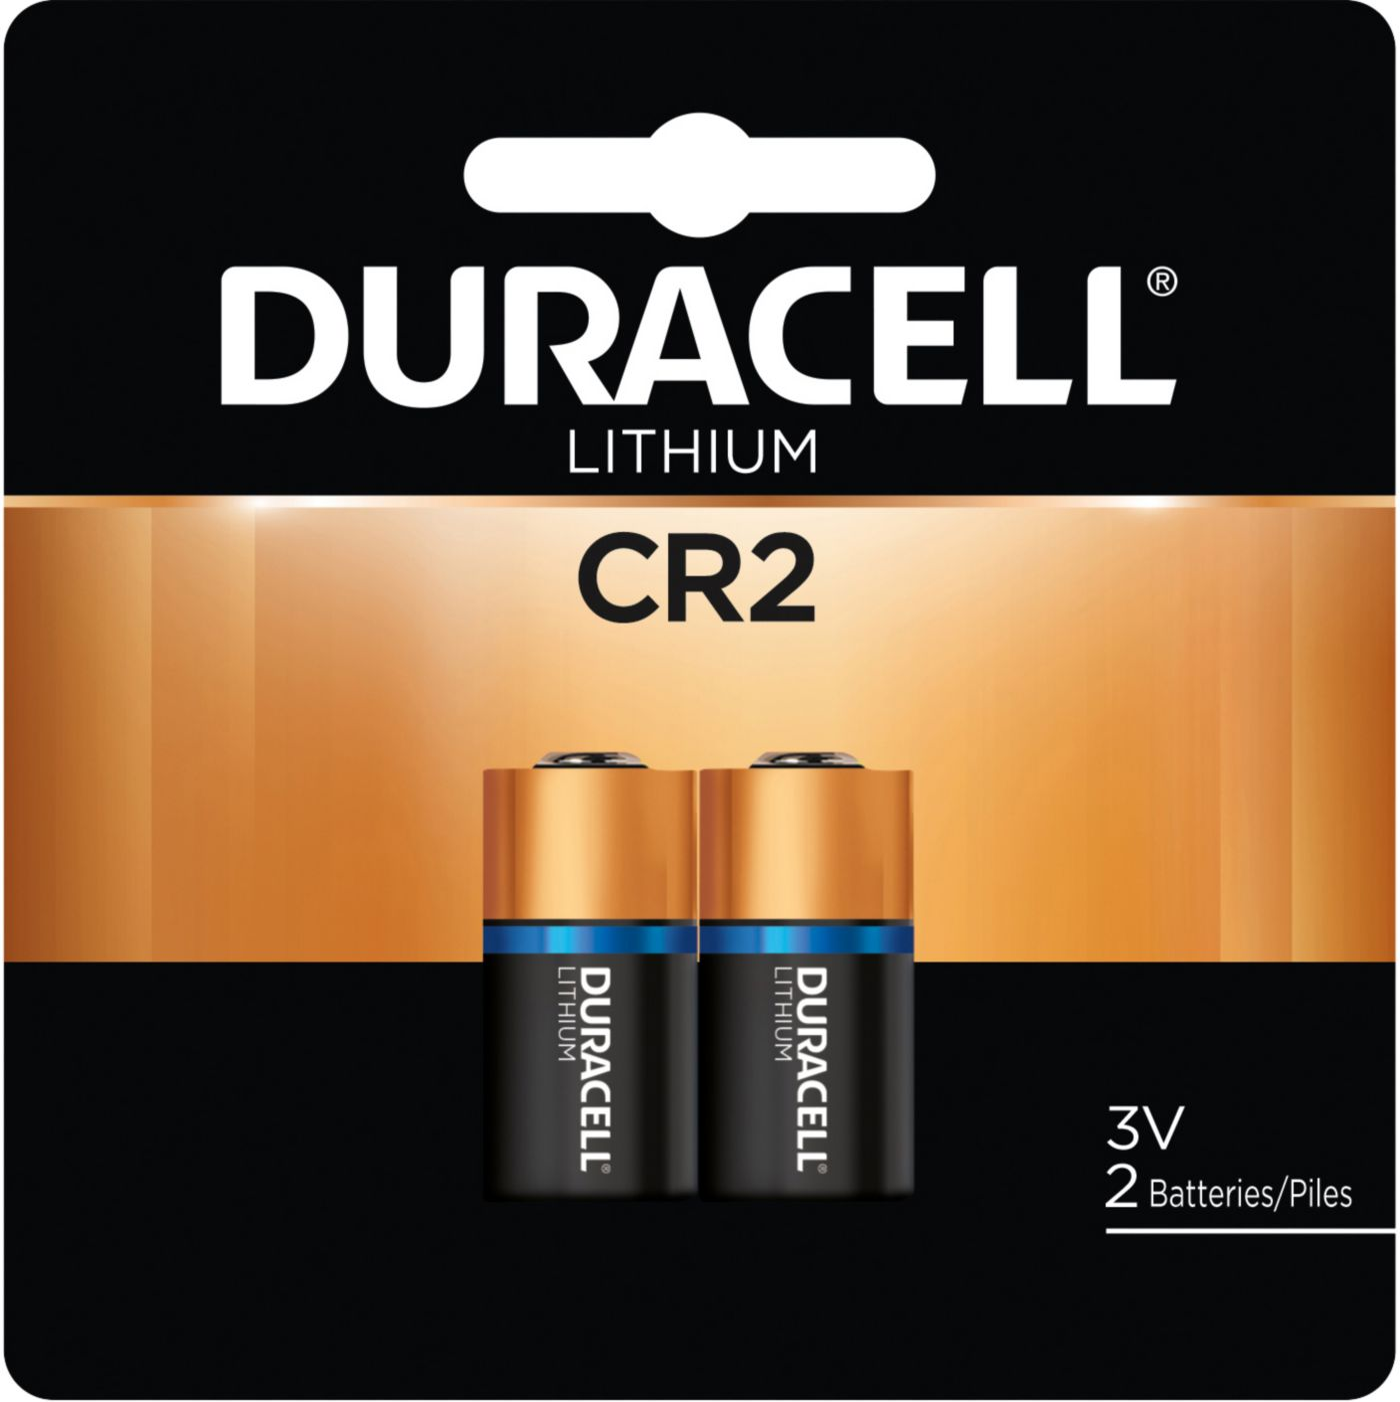 Duracell CR2 3V Lithium Batteries – 2 Pack